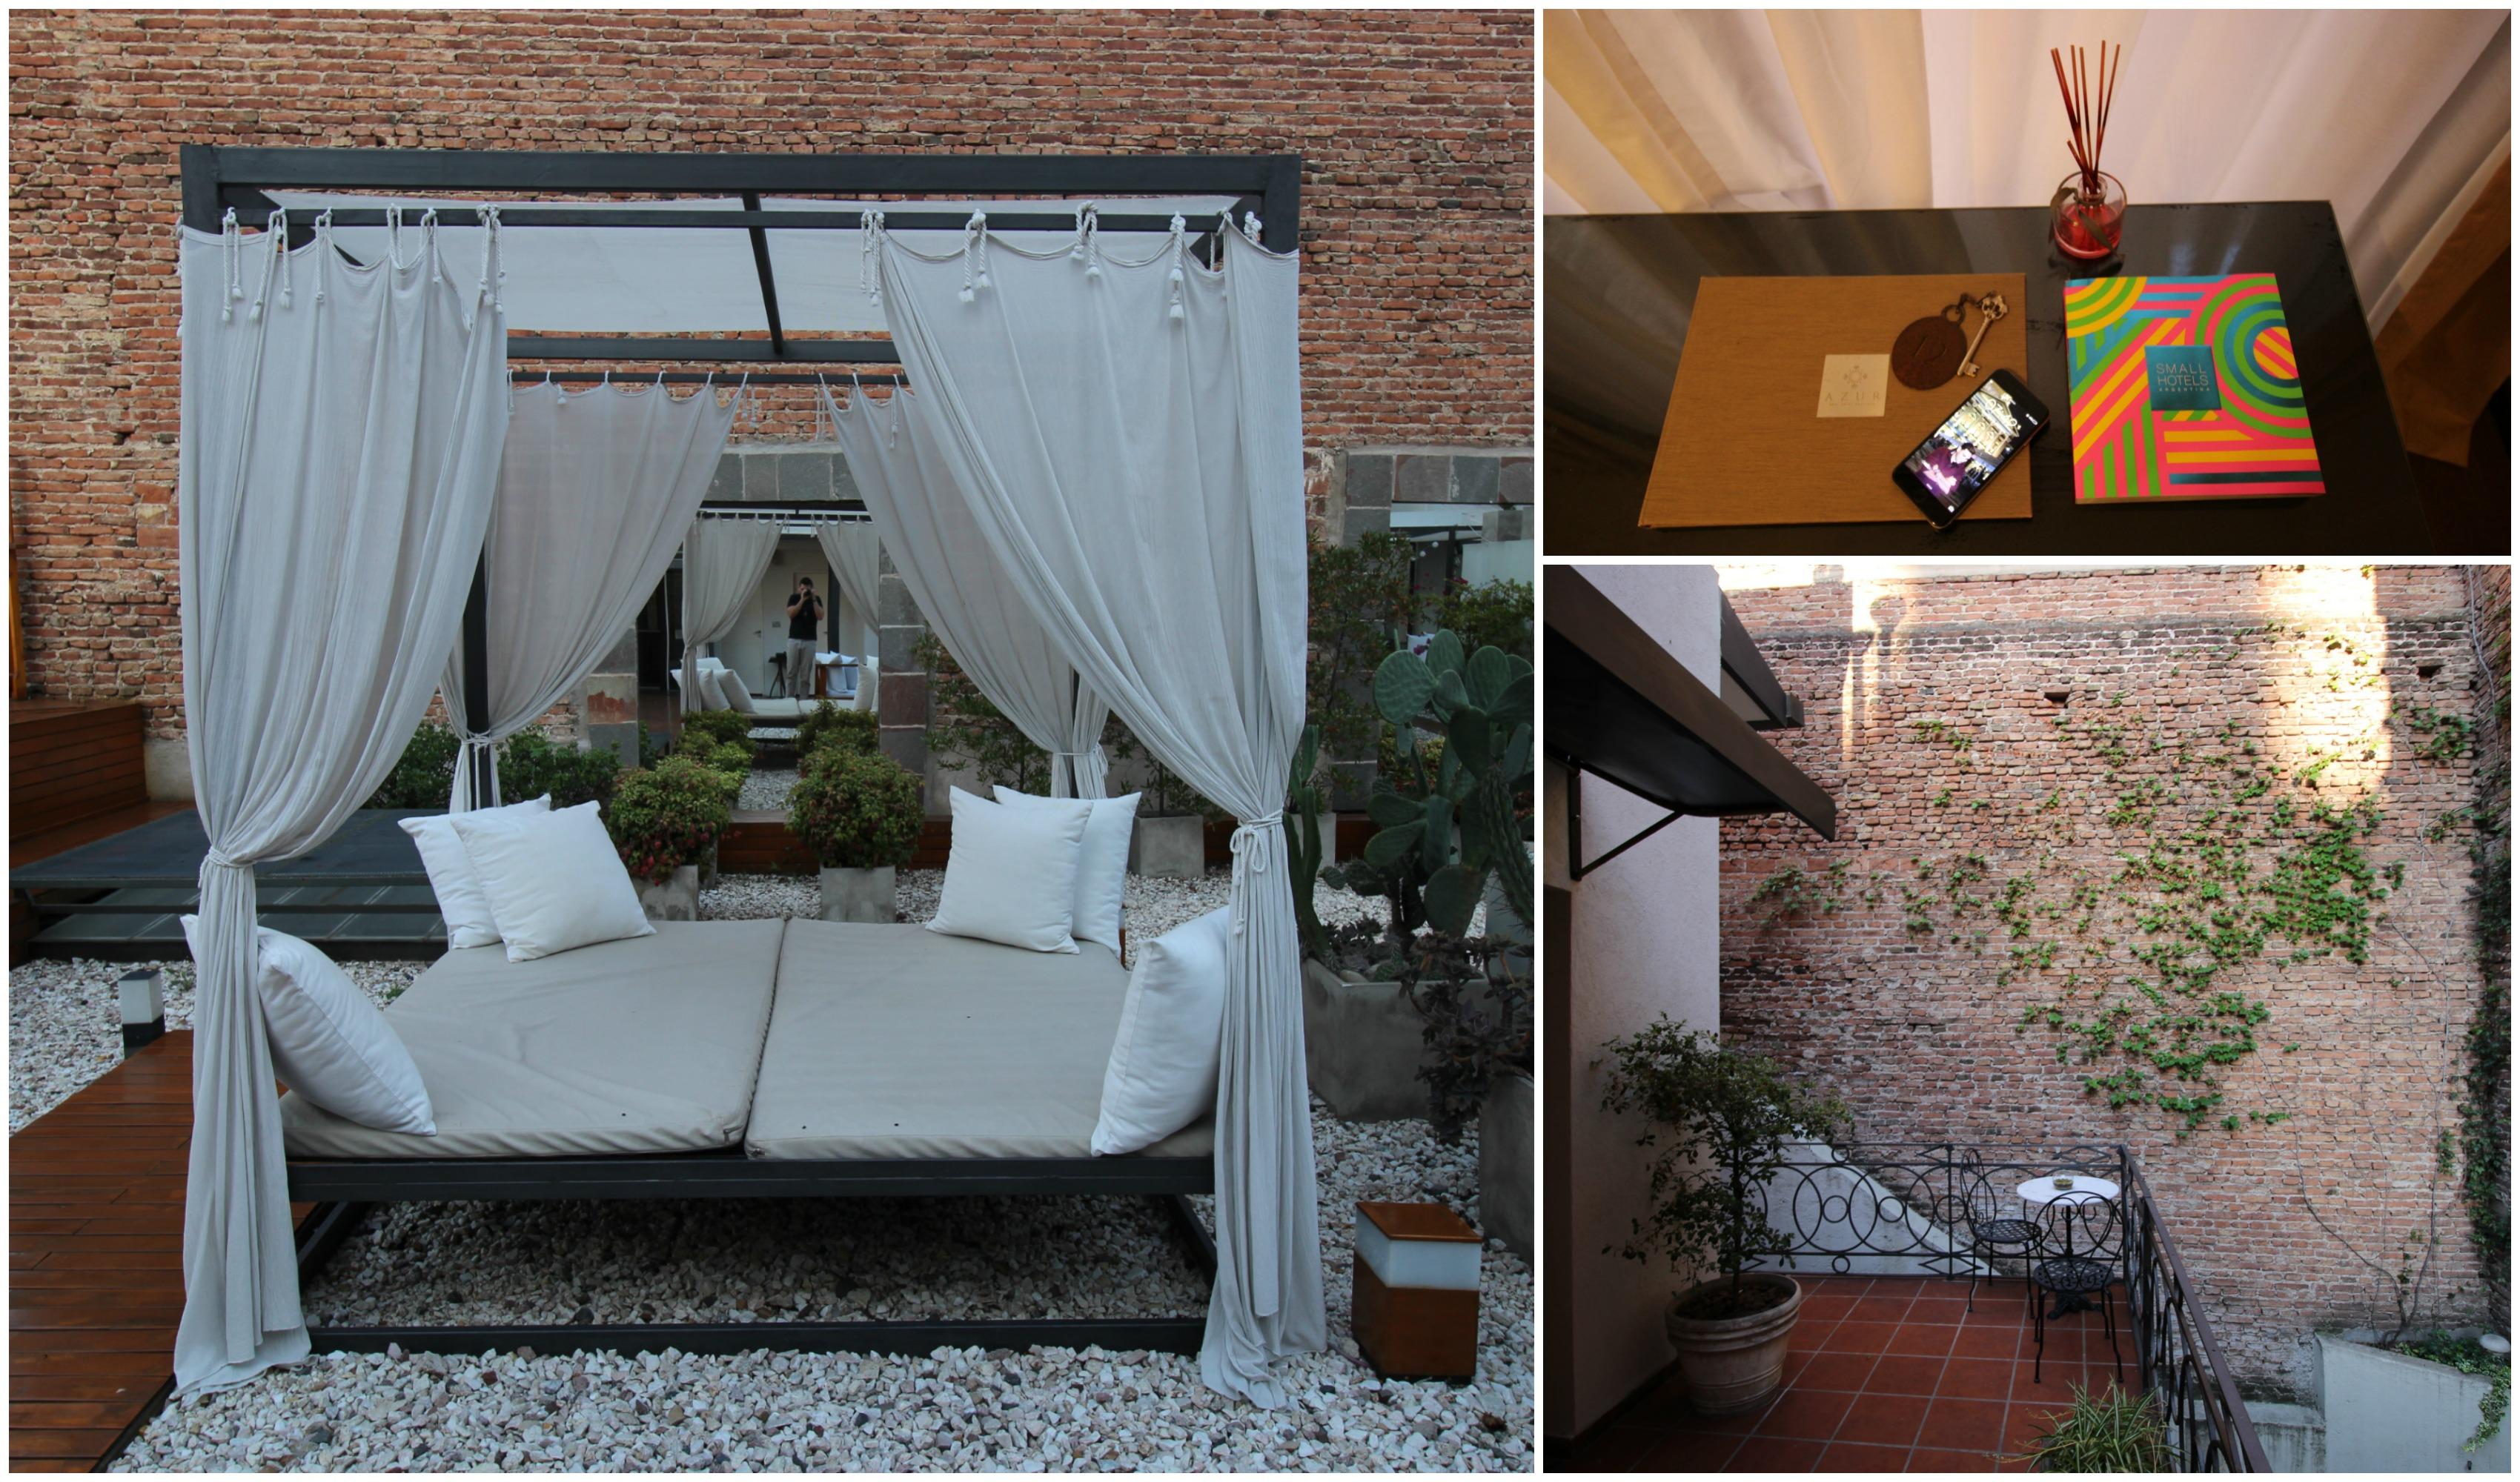 Azul Real Hotel Boutique Cordoba Argentina 4